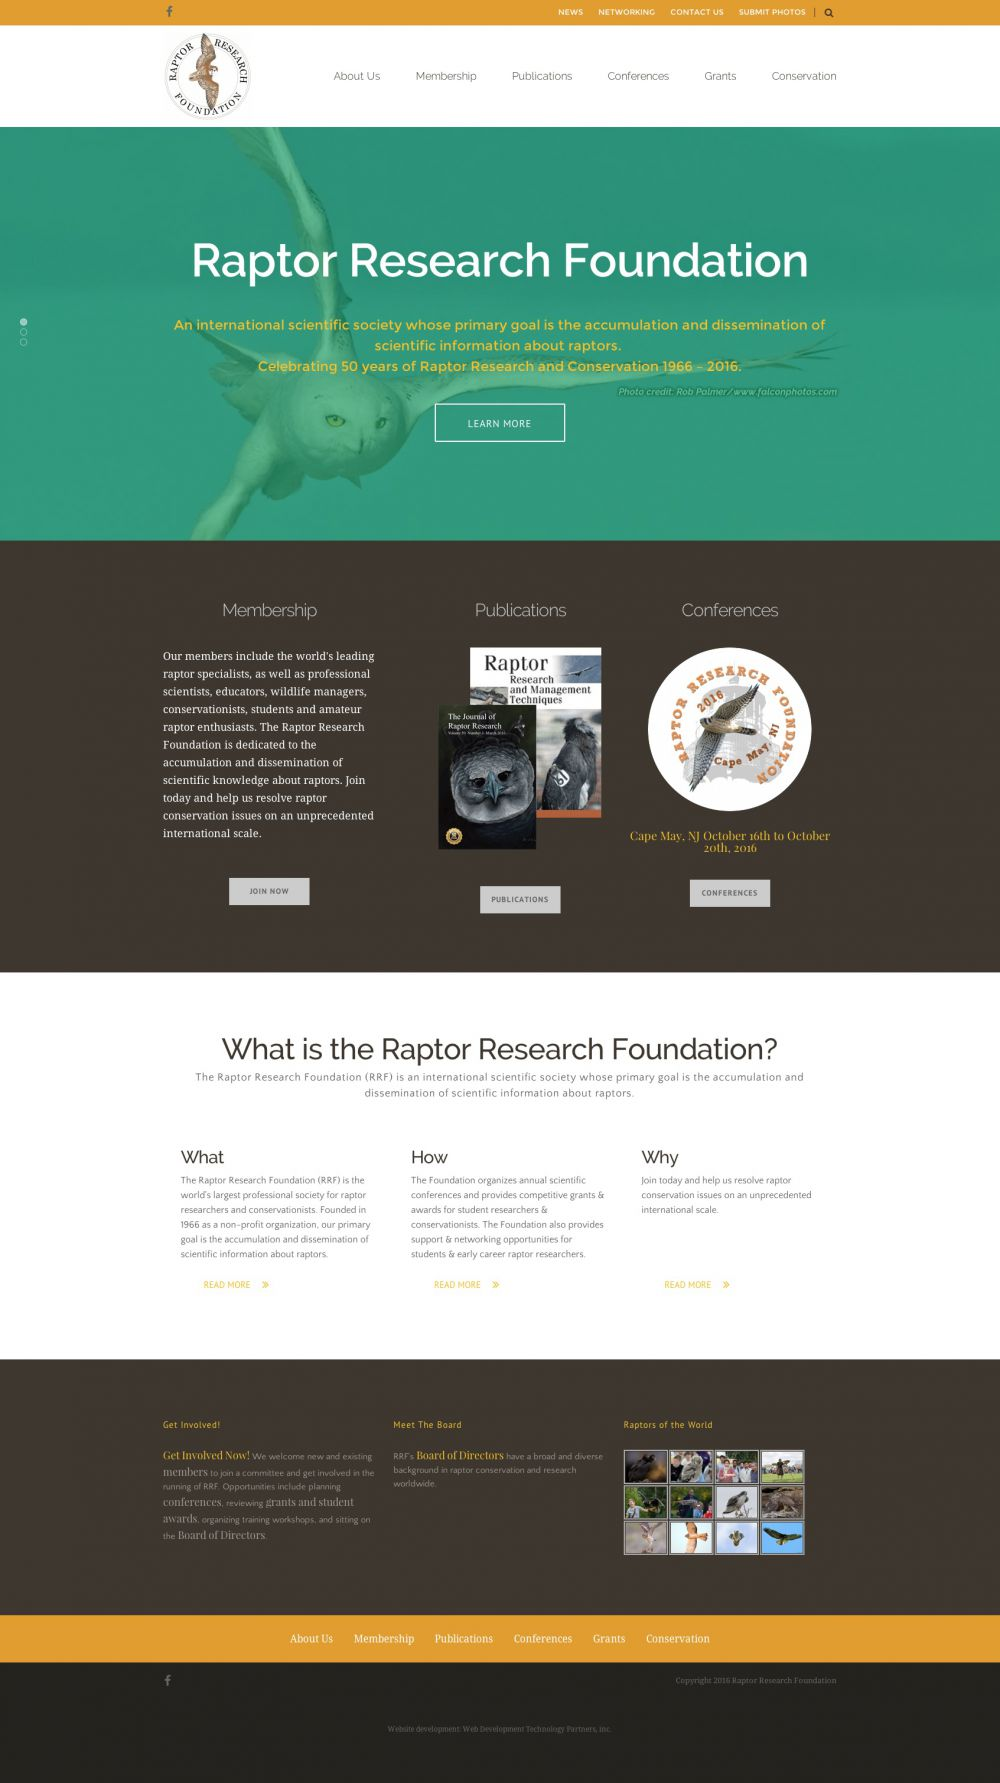 Raptor Research Foundation